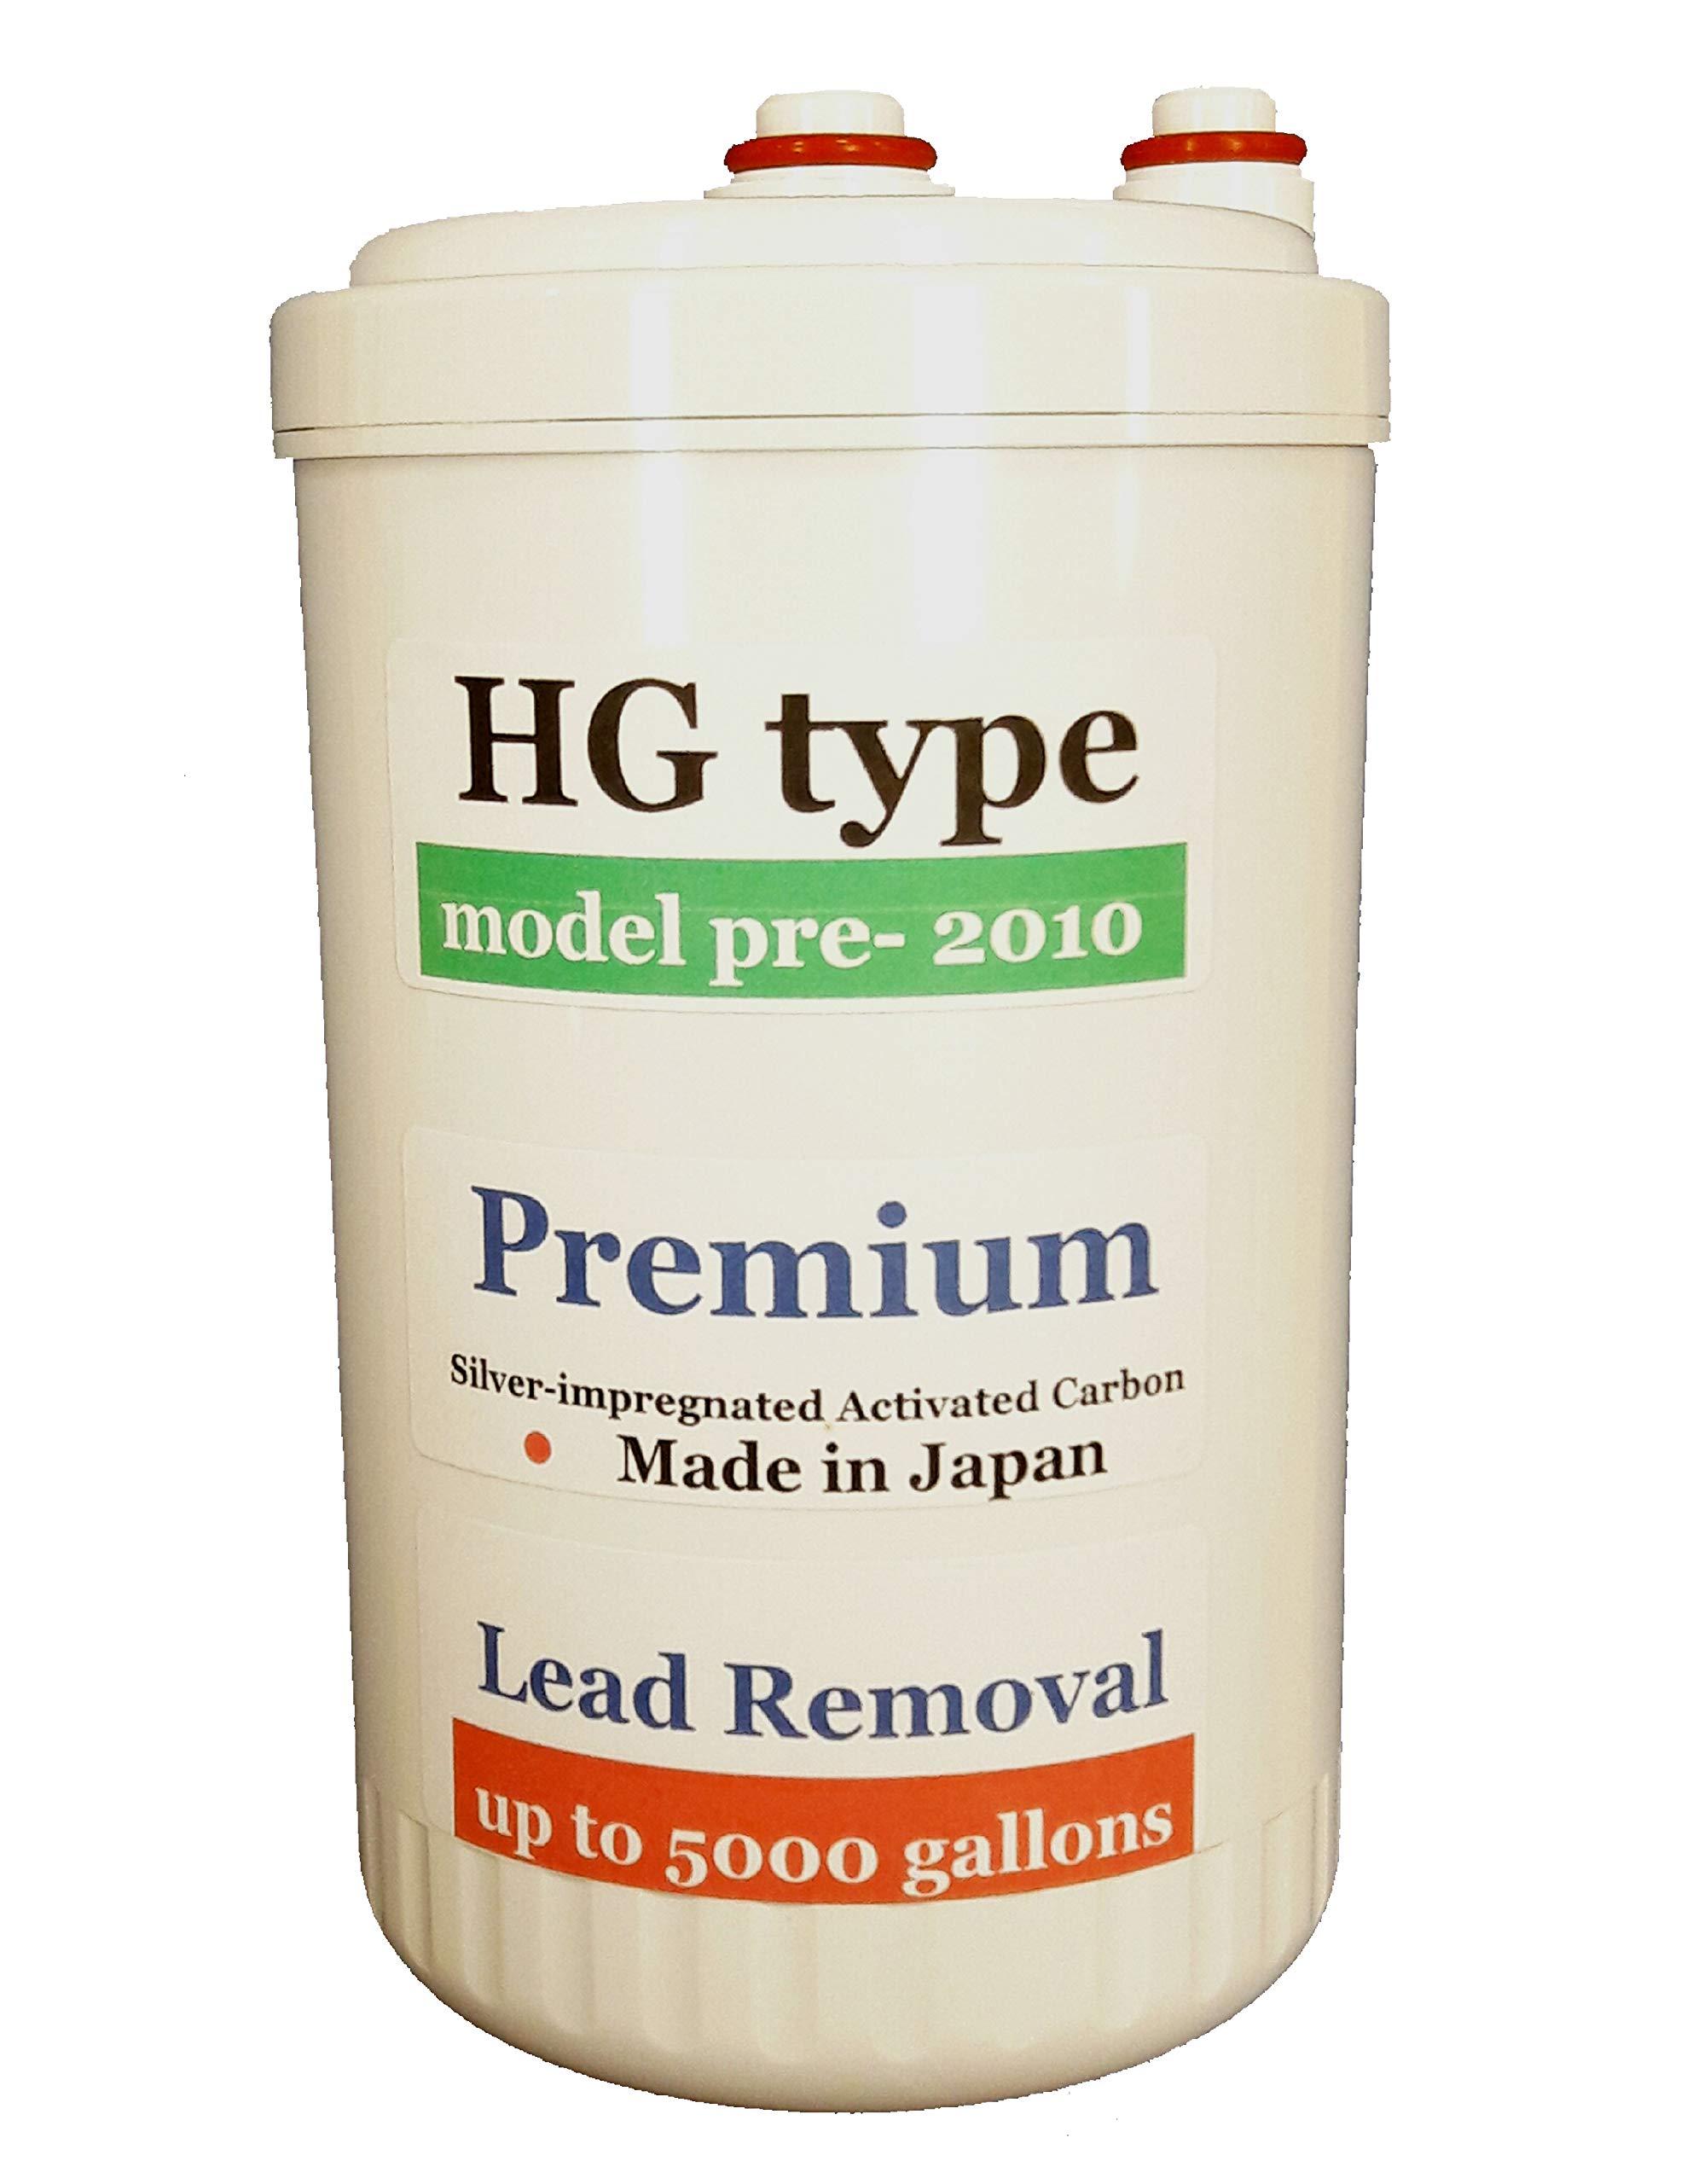 Japan Made Genuine Premium Grade Compatible Filter for MW-7000HG Replacement Filter for Enagic Kangen SD501HG - ''HG'' Original Model(Not Compatible with HG-N Models)